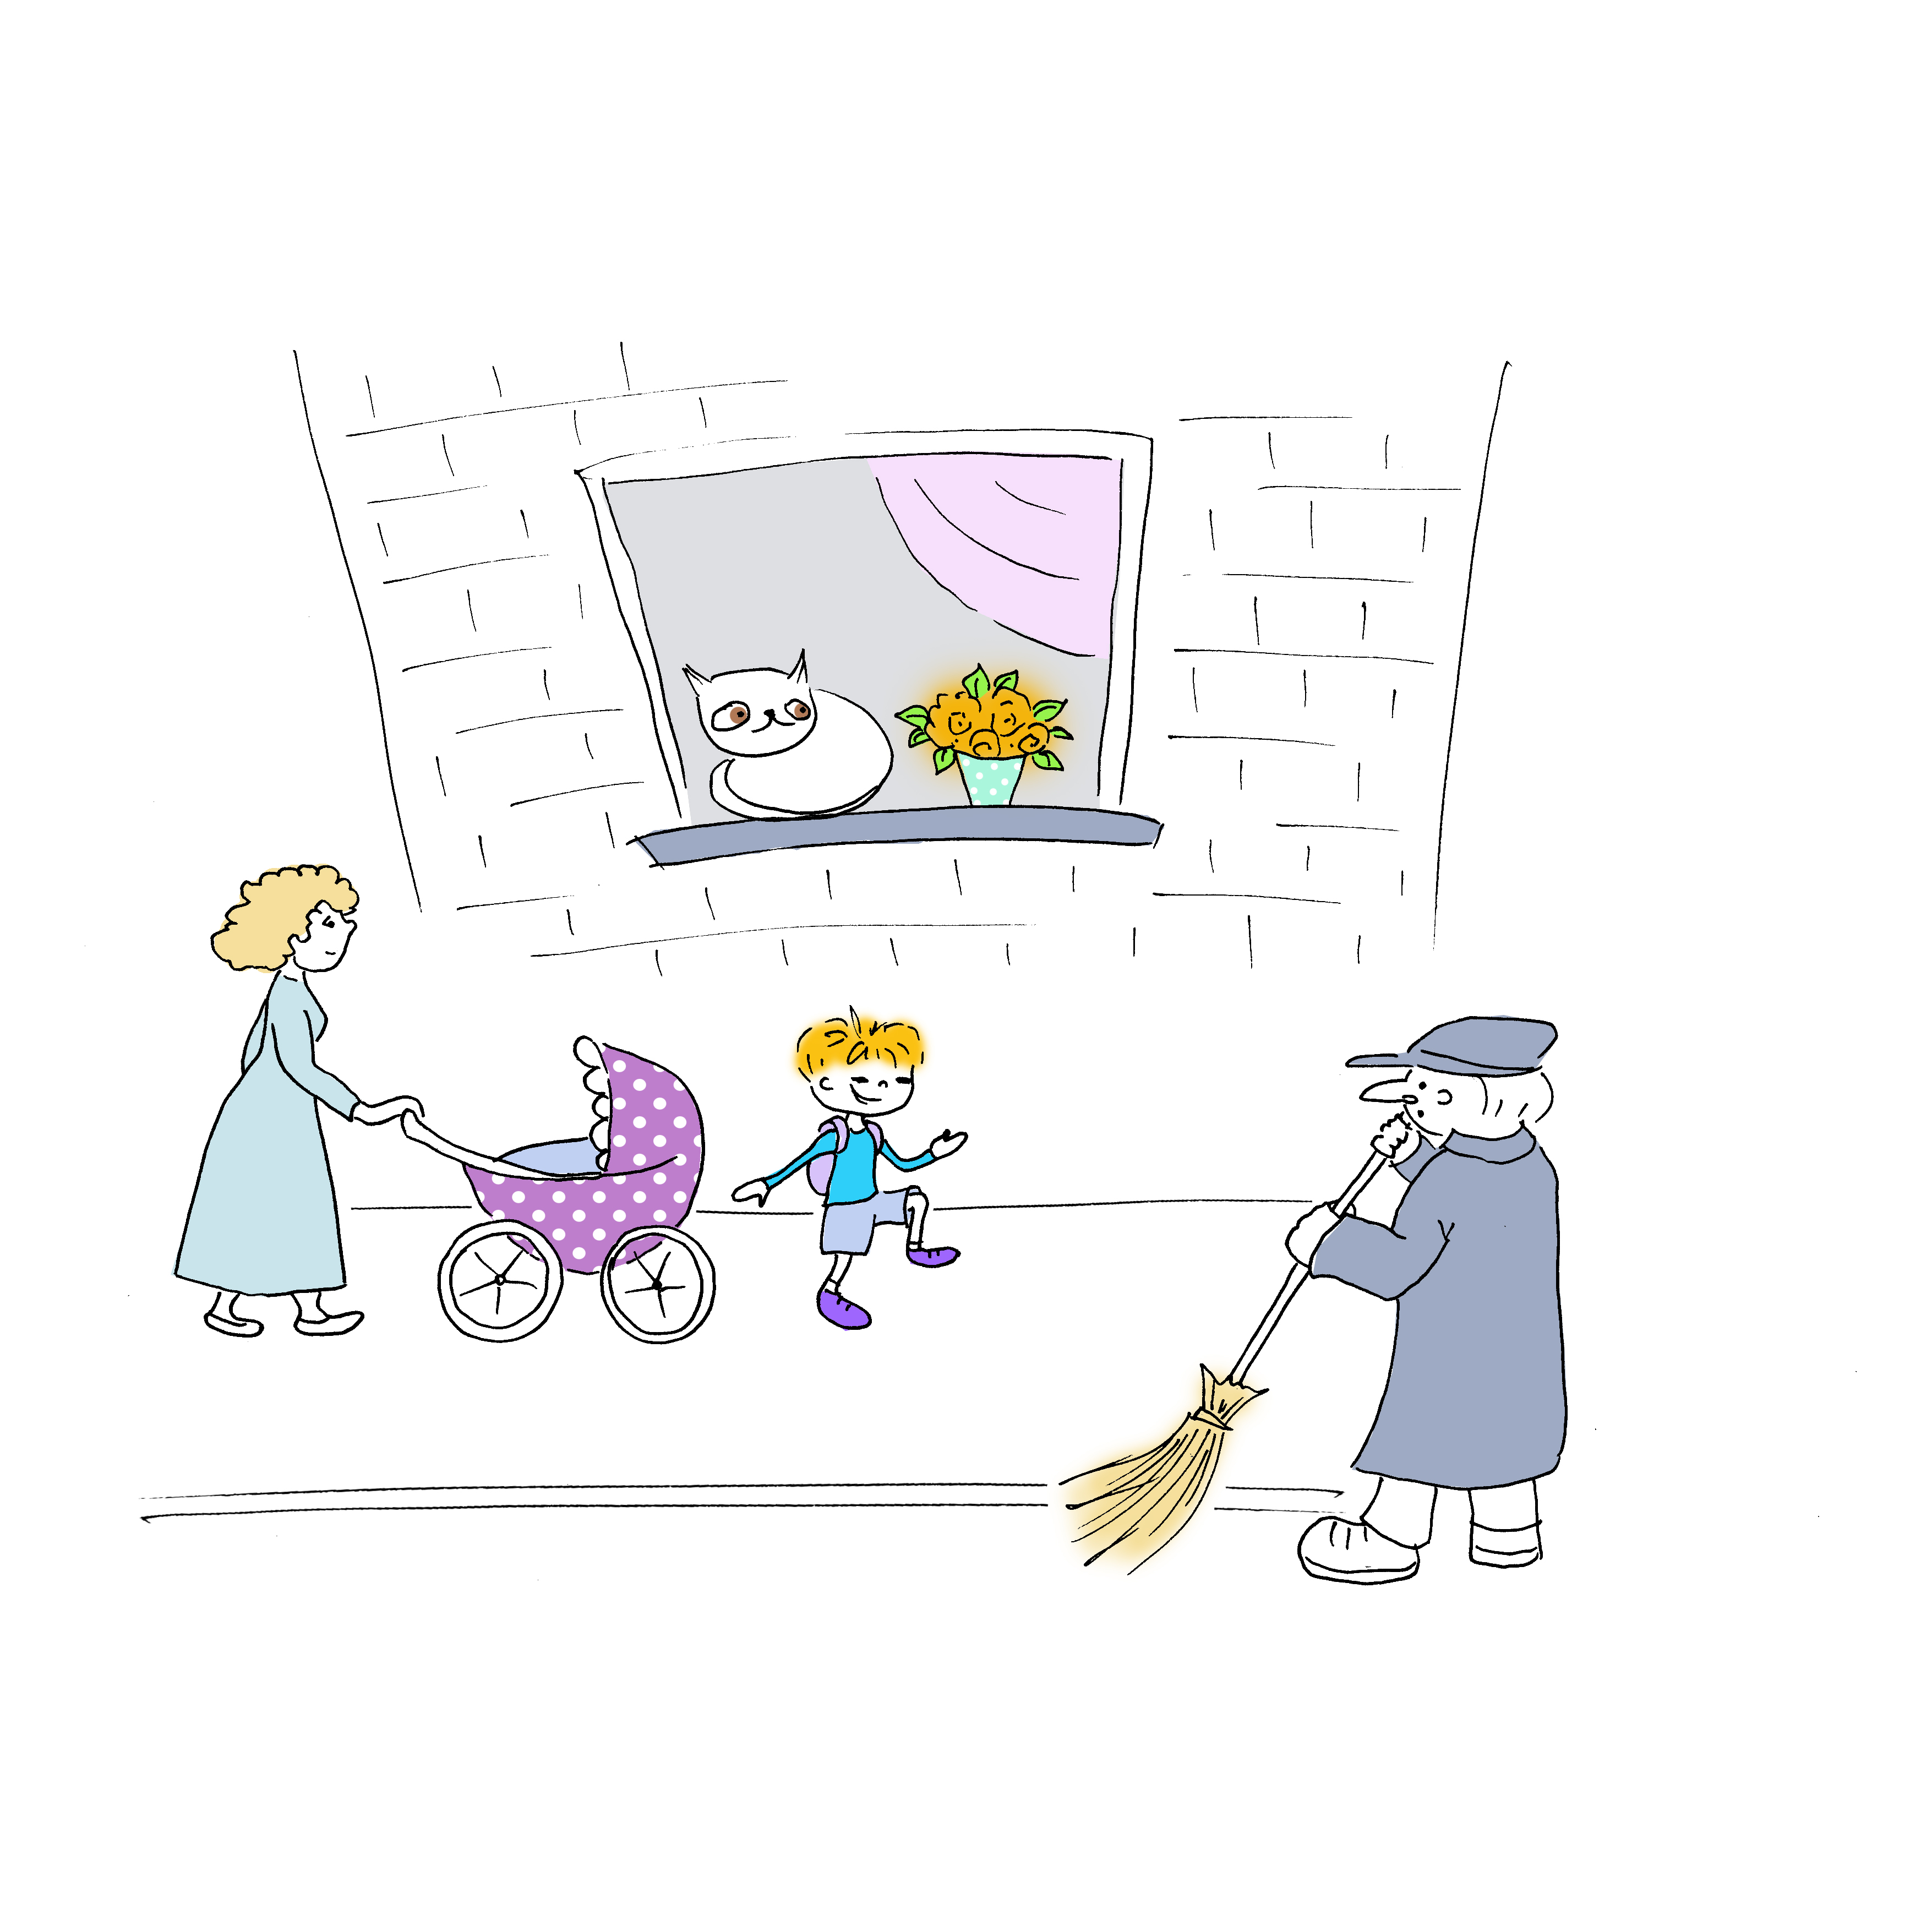 Мими&Китти – 14 – Китти учится быть смелой by Irena Brodeski - Illustrated by Irena Brodeski - Ourboox.com